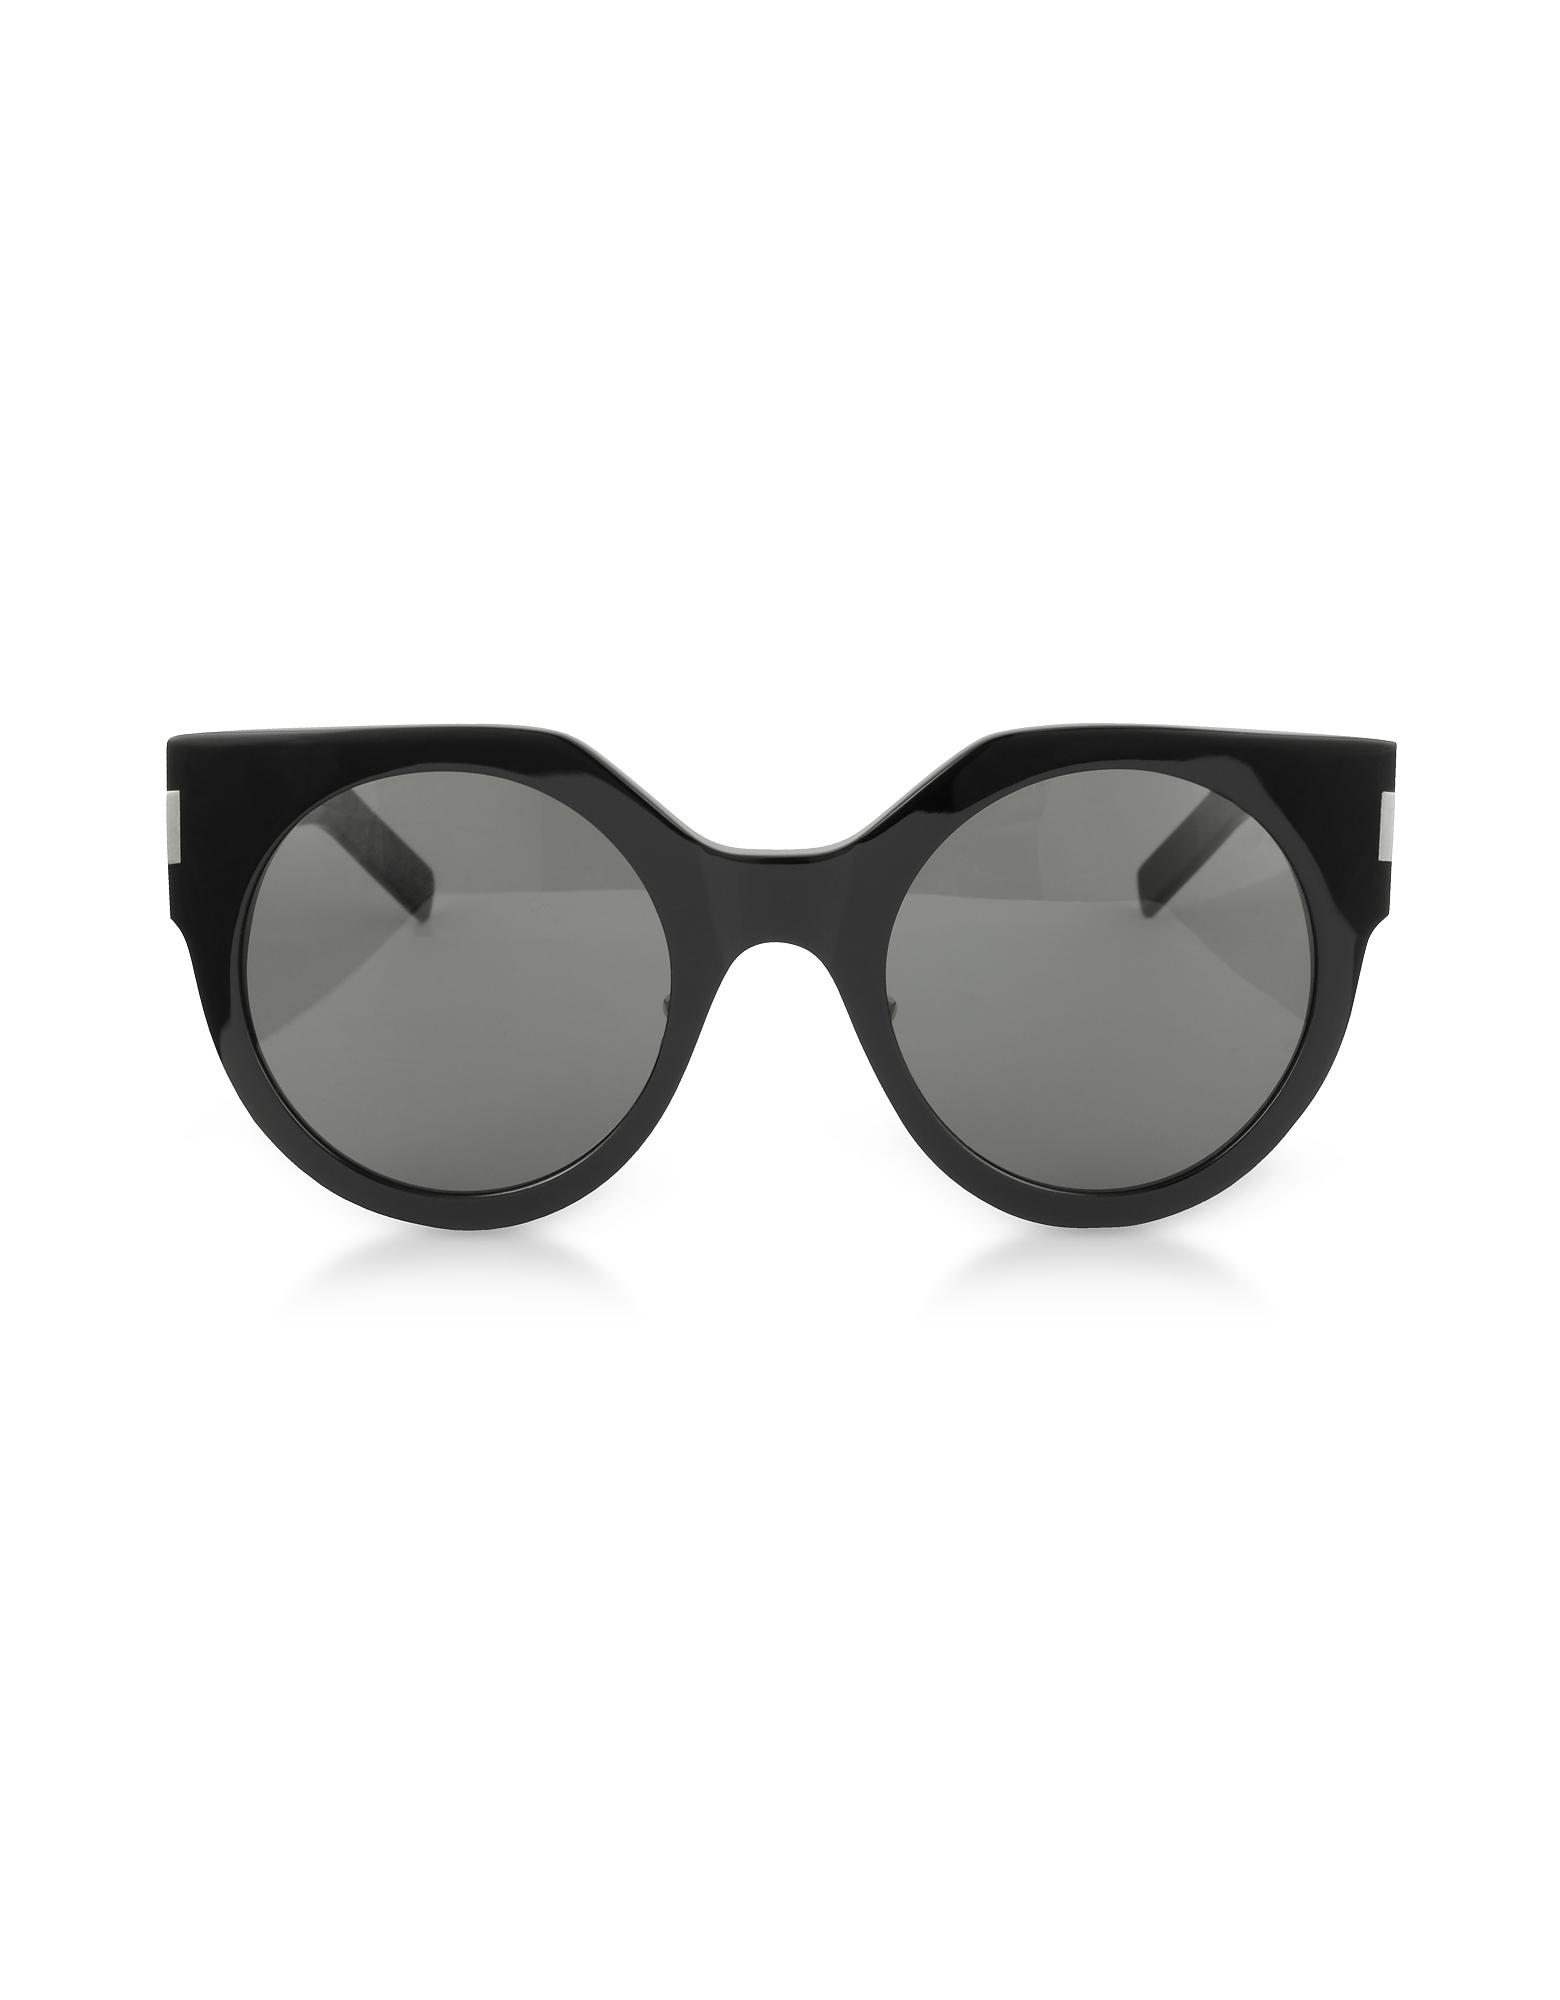 SL 185 Slim Shiny Black Acetate Women's Sunglasses